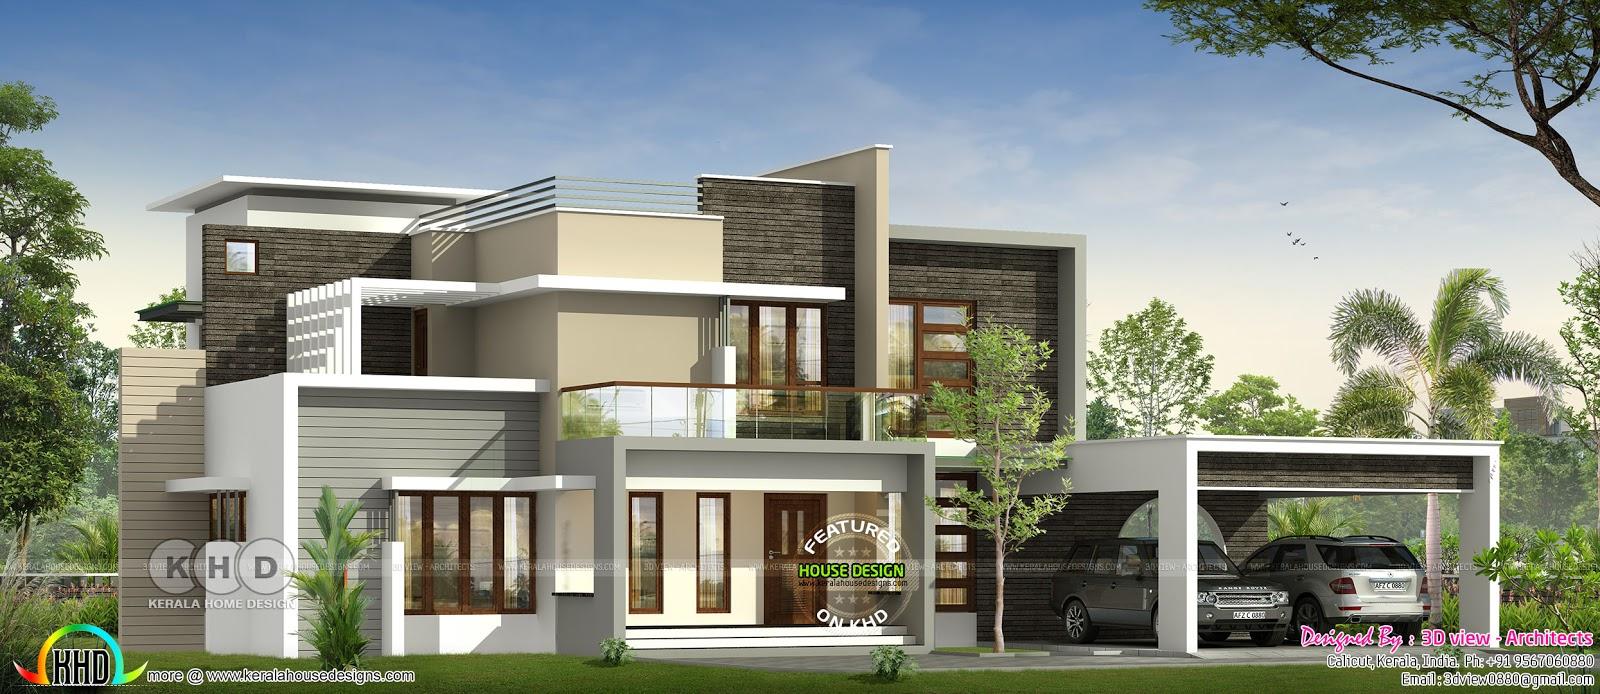 4 Bhk Luxurious Flat Roof Contemporary Home Kerala Home Design Bloglovin